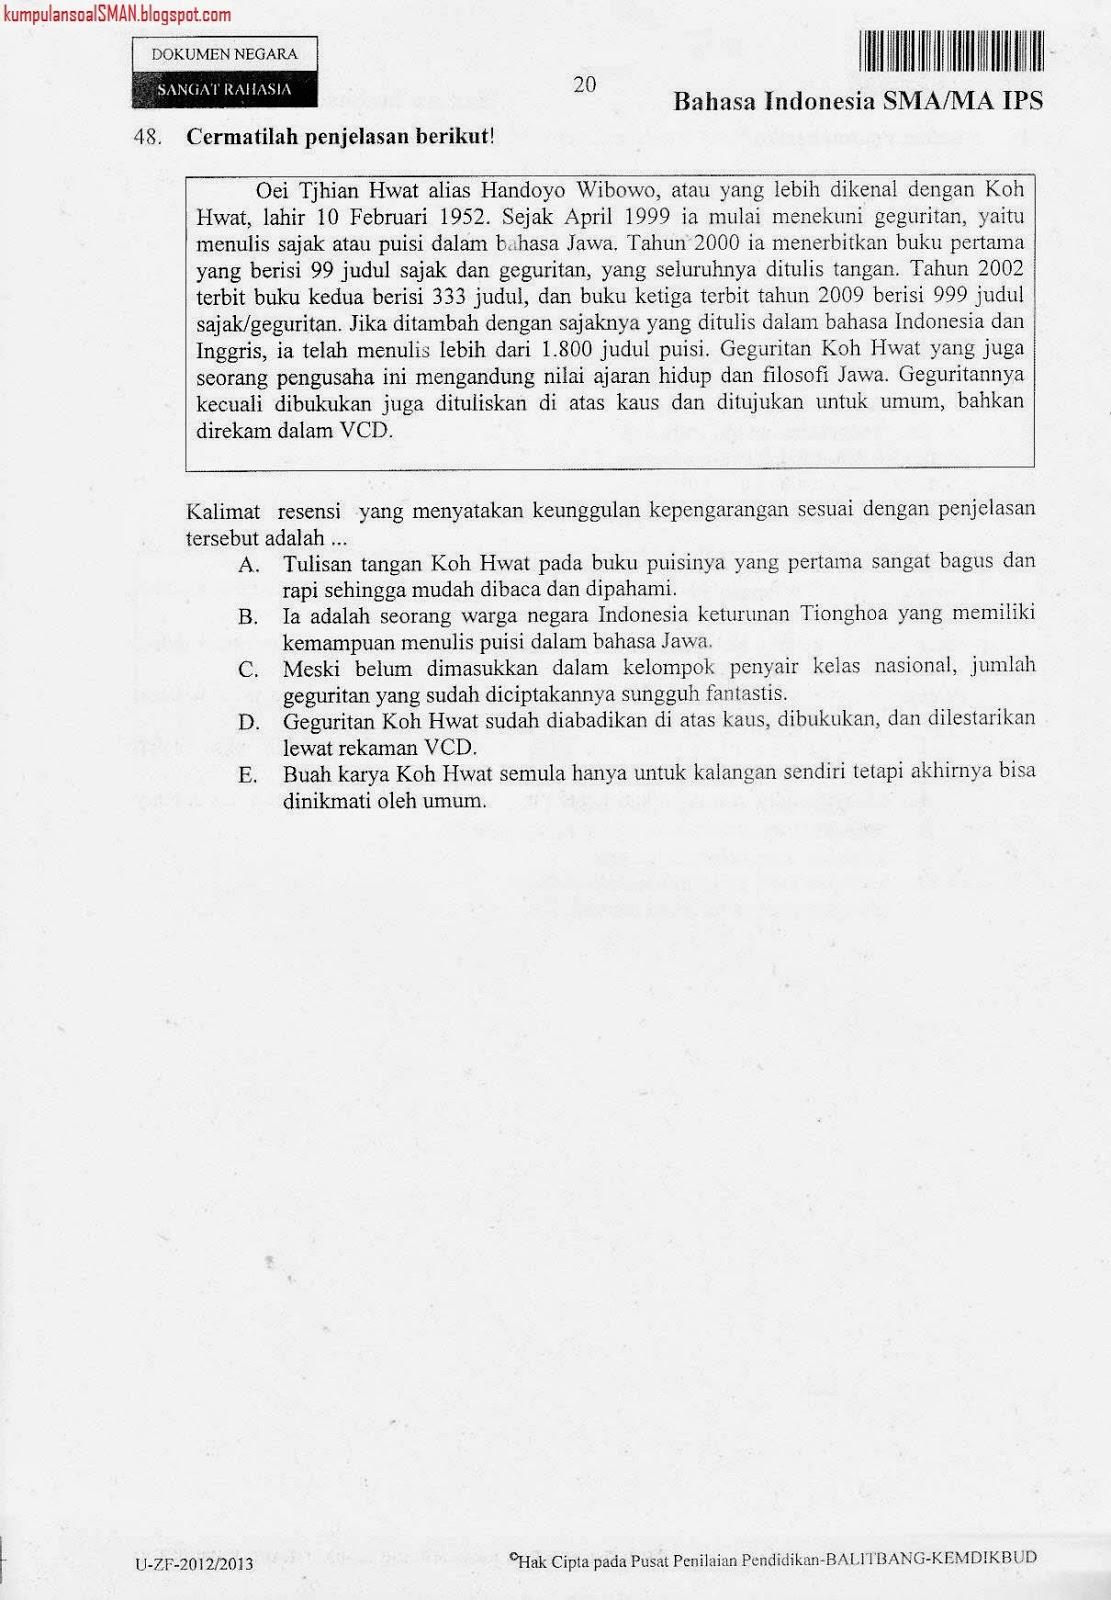 Soal Un Bahasa Indonesia Sma Ips Kode 55 2012 2013 Download Soal Sma Ma Gratis